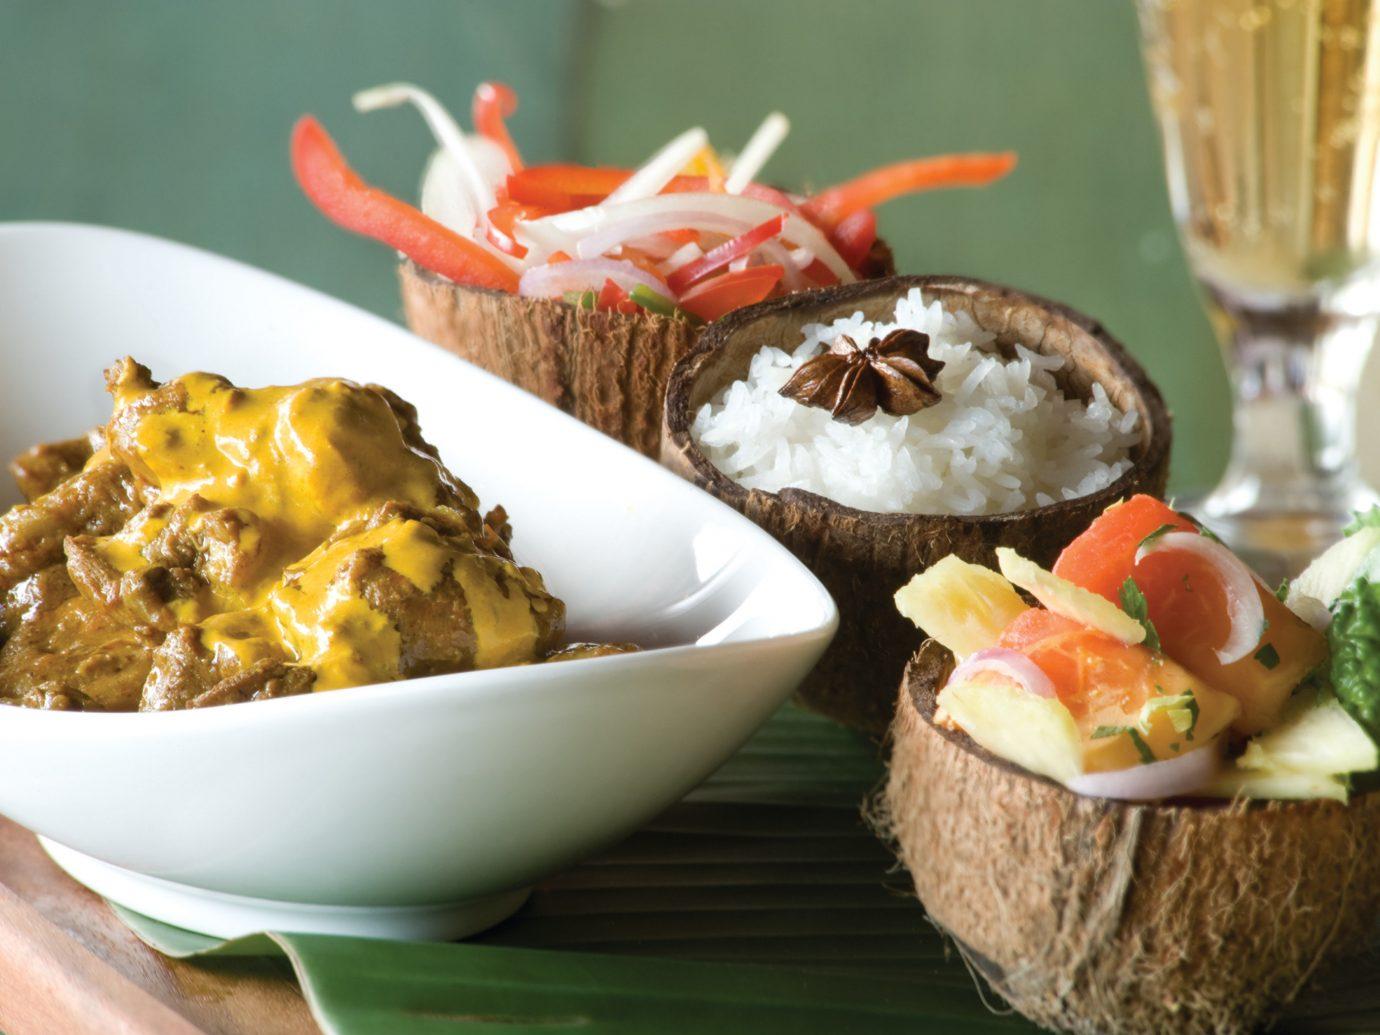 Hotels food dish meal cuisine breakfast produce vegetable several